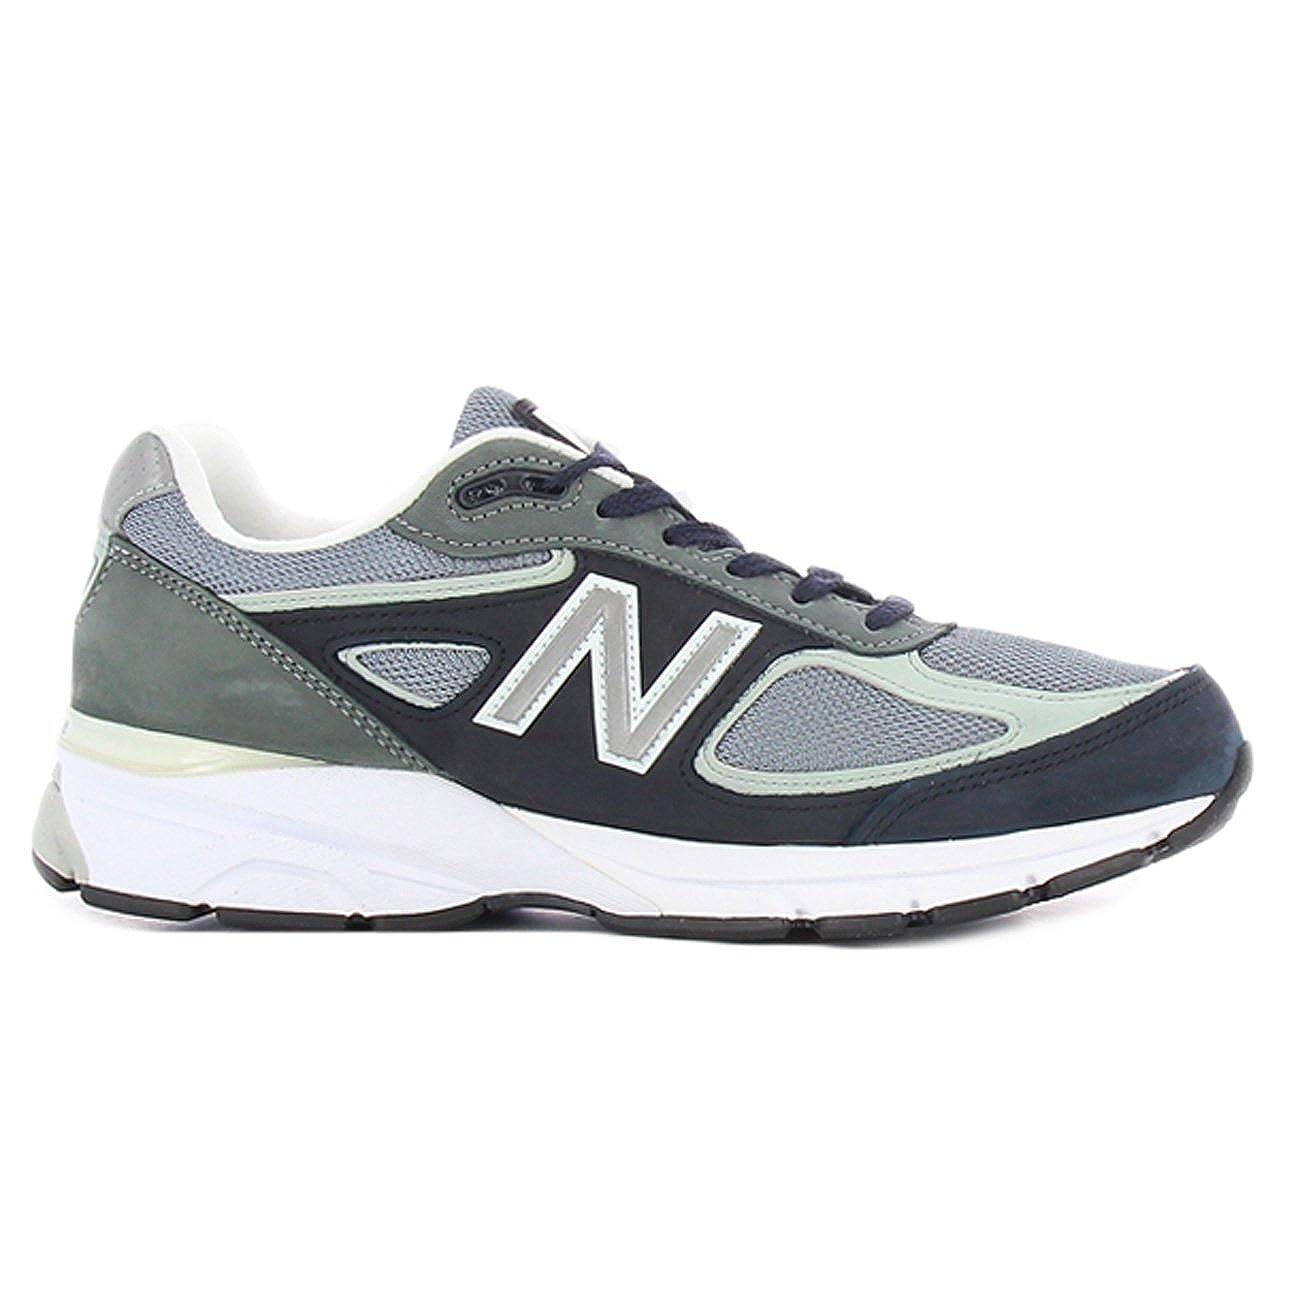 uk availability 92a81 e2666 New Balance 990 XG4 Sneaker: Amazon.co.uk: Shoes & Bags